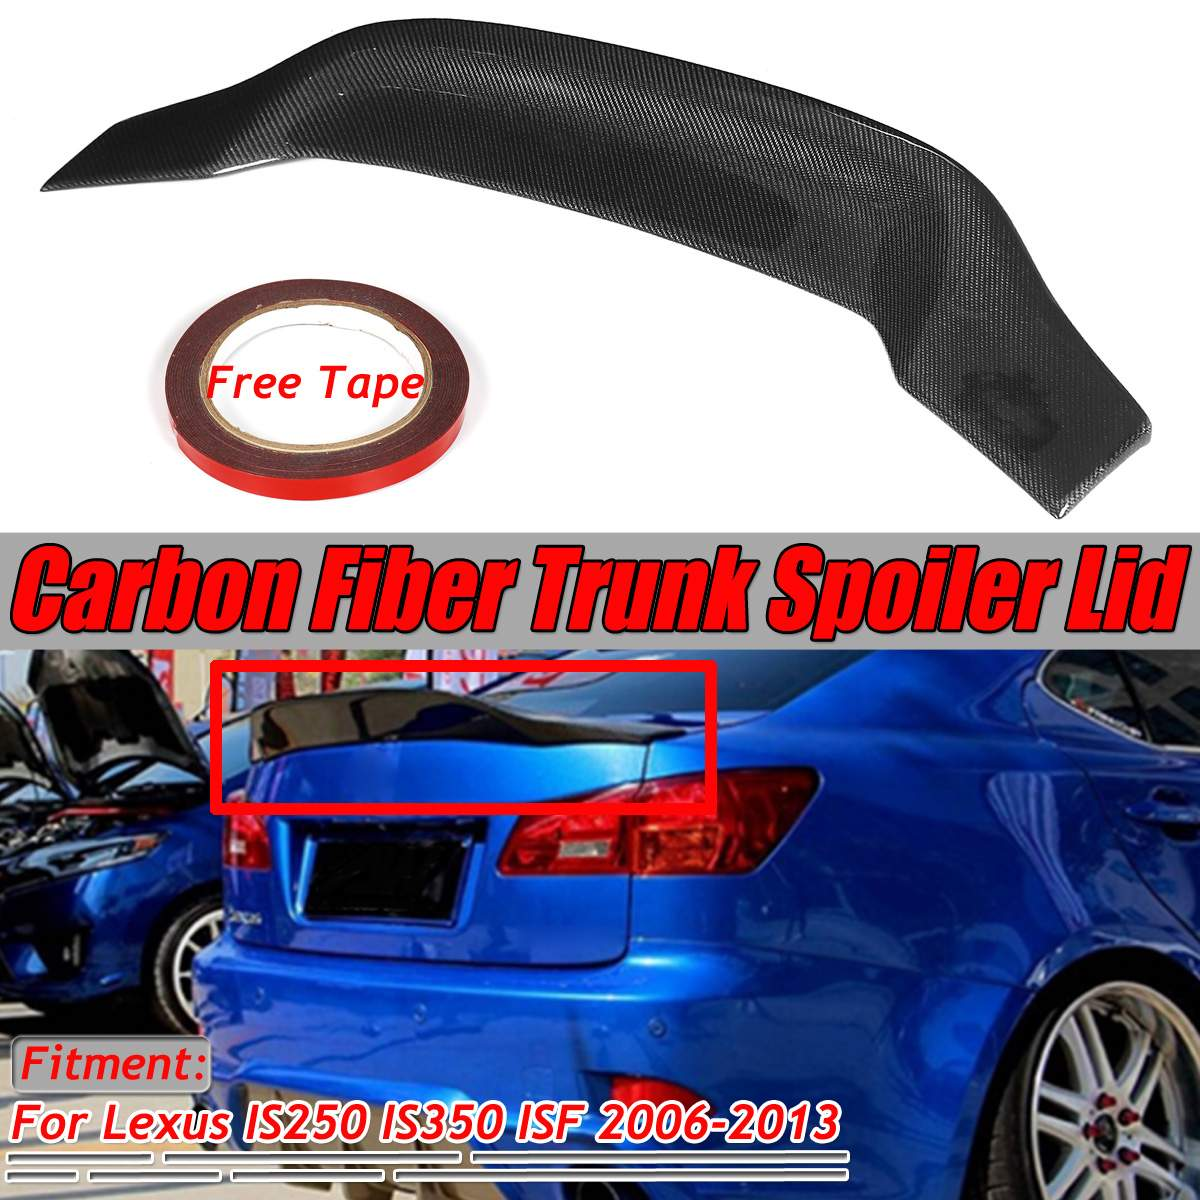 Pico de pato patada alta de fibra de carbono Real trasera de coche alerón para maletero Spoiler ala tapa para Lexus IS250 IS350 ISF 2006-2013 ala trasera